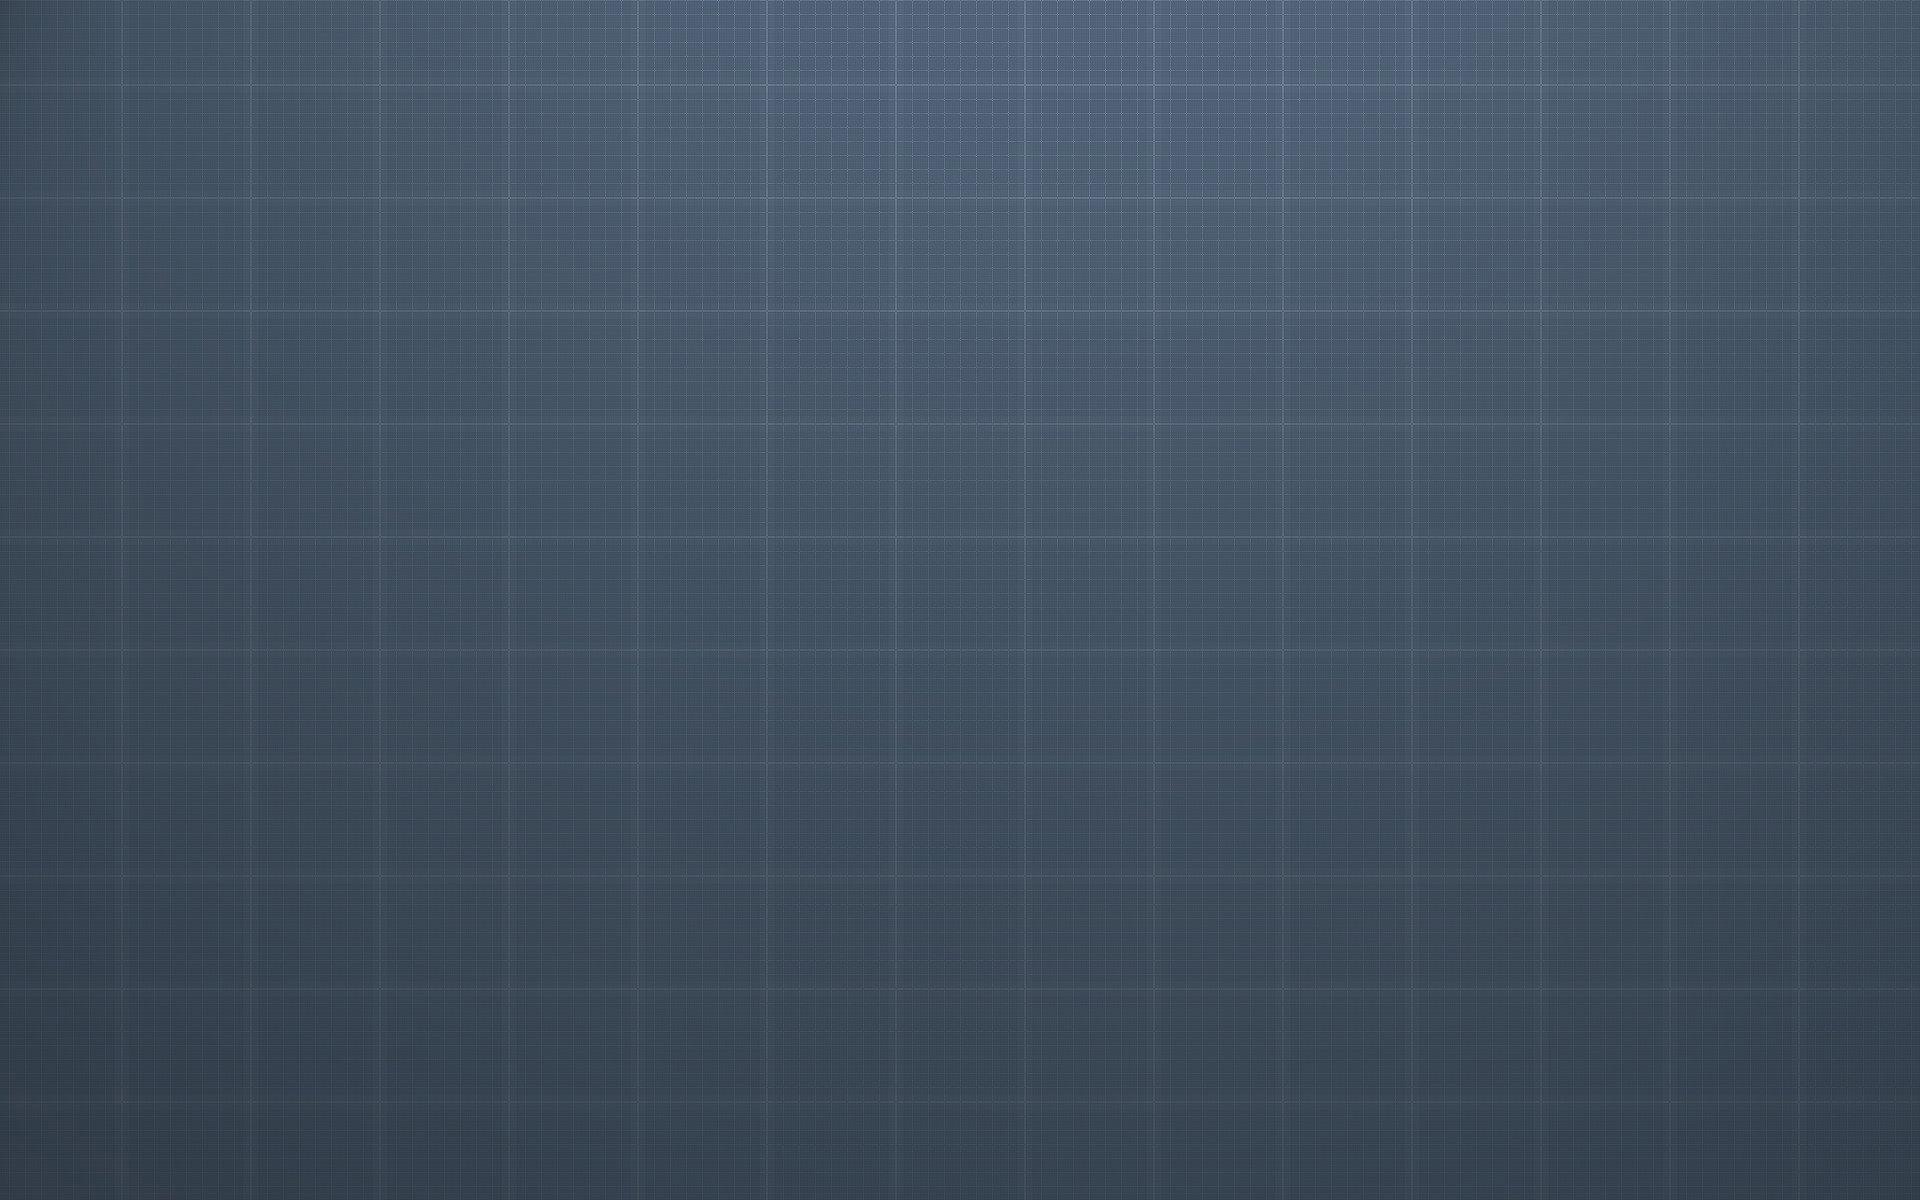 Картинки Квадраты, фон, сетка, линии фото и обои на рабочий стол